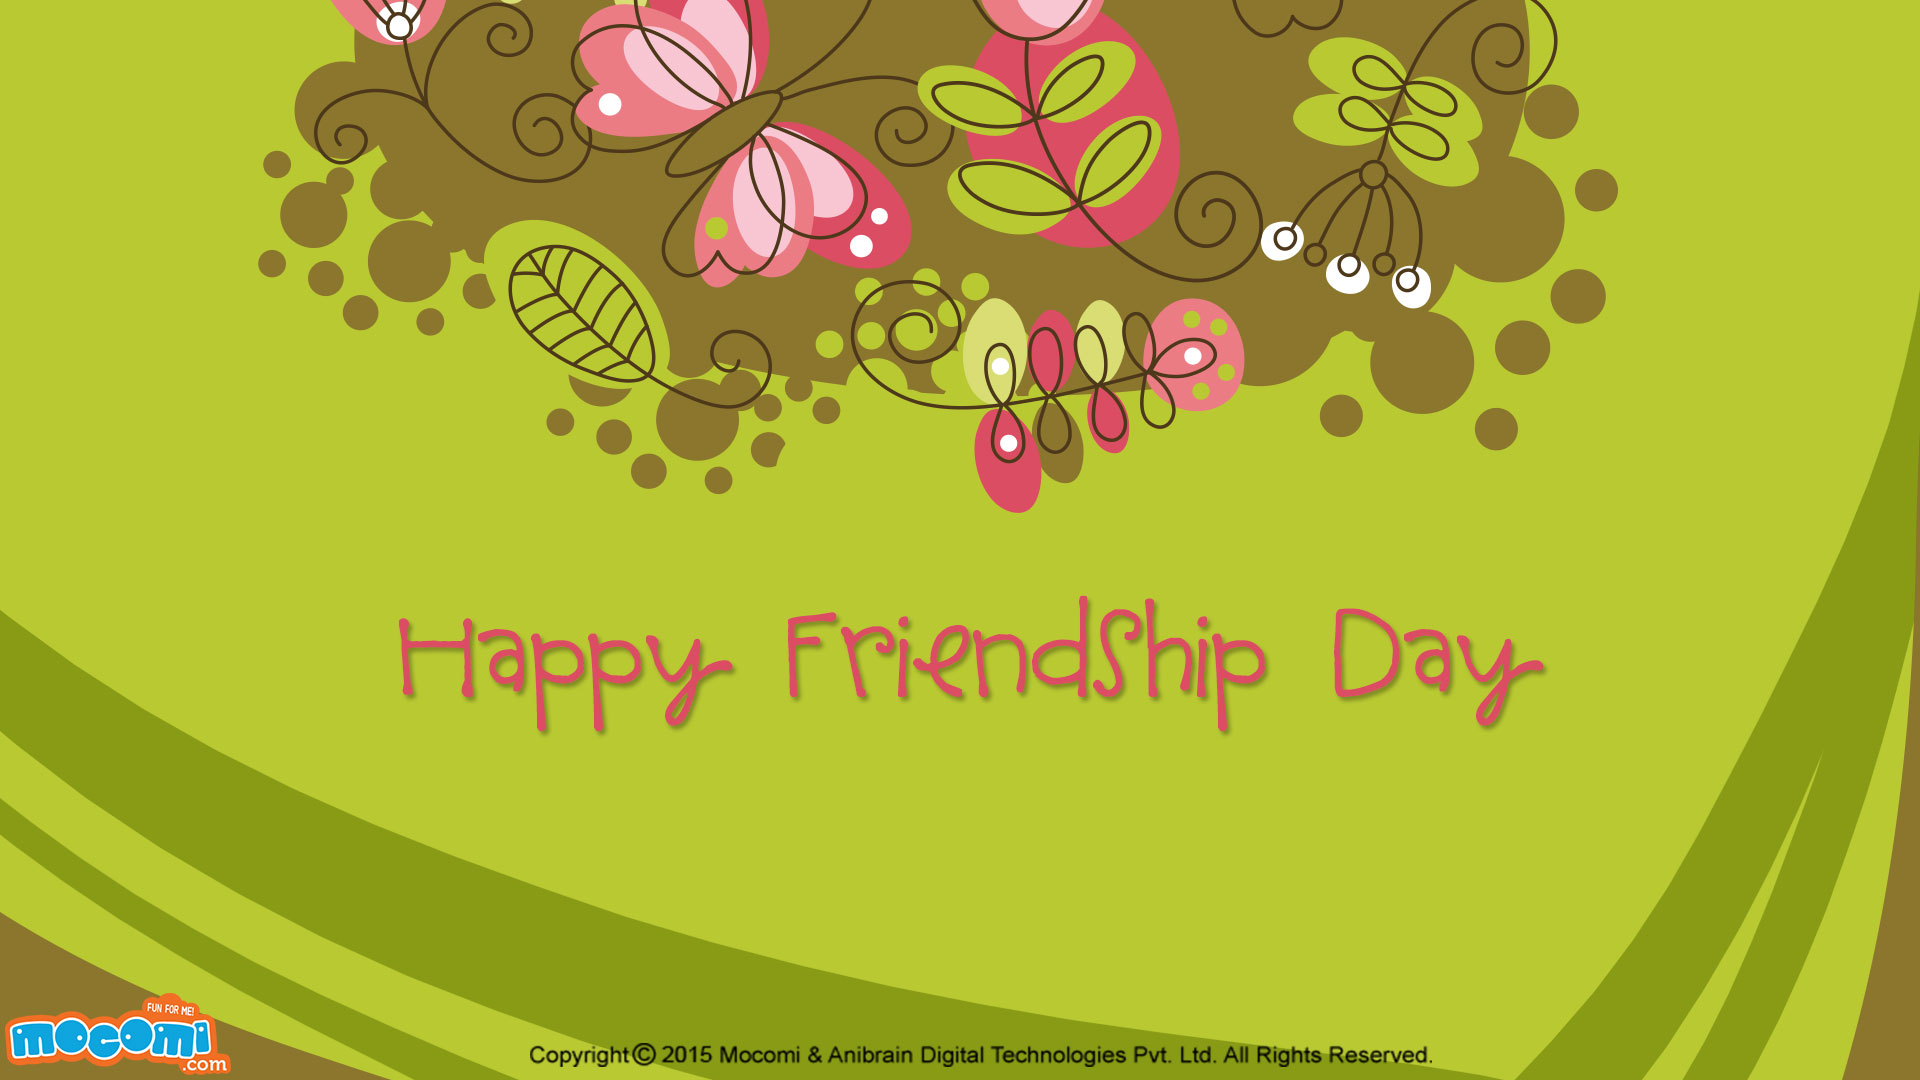 Happy Friendship Day Wallpaper – 05